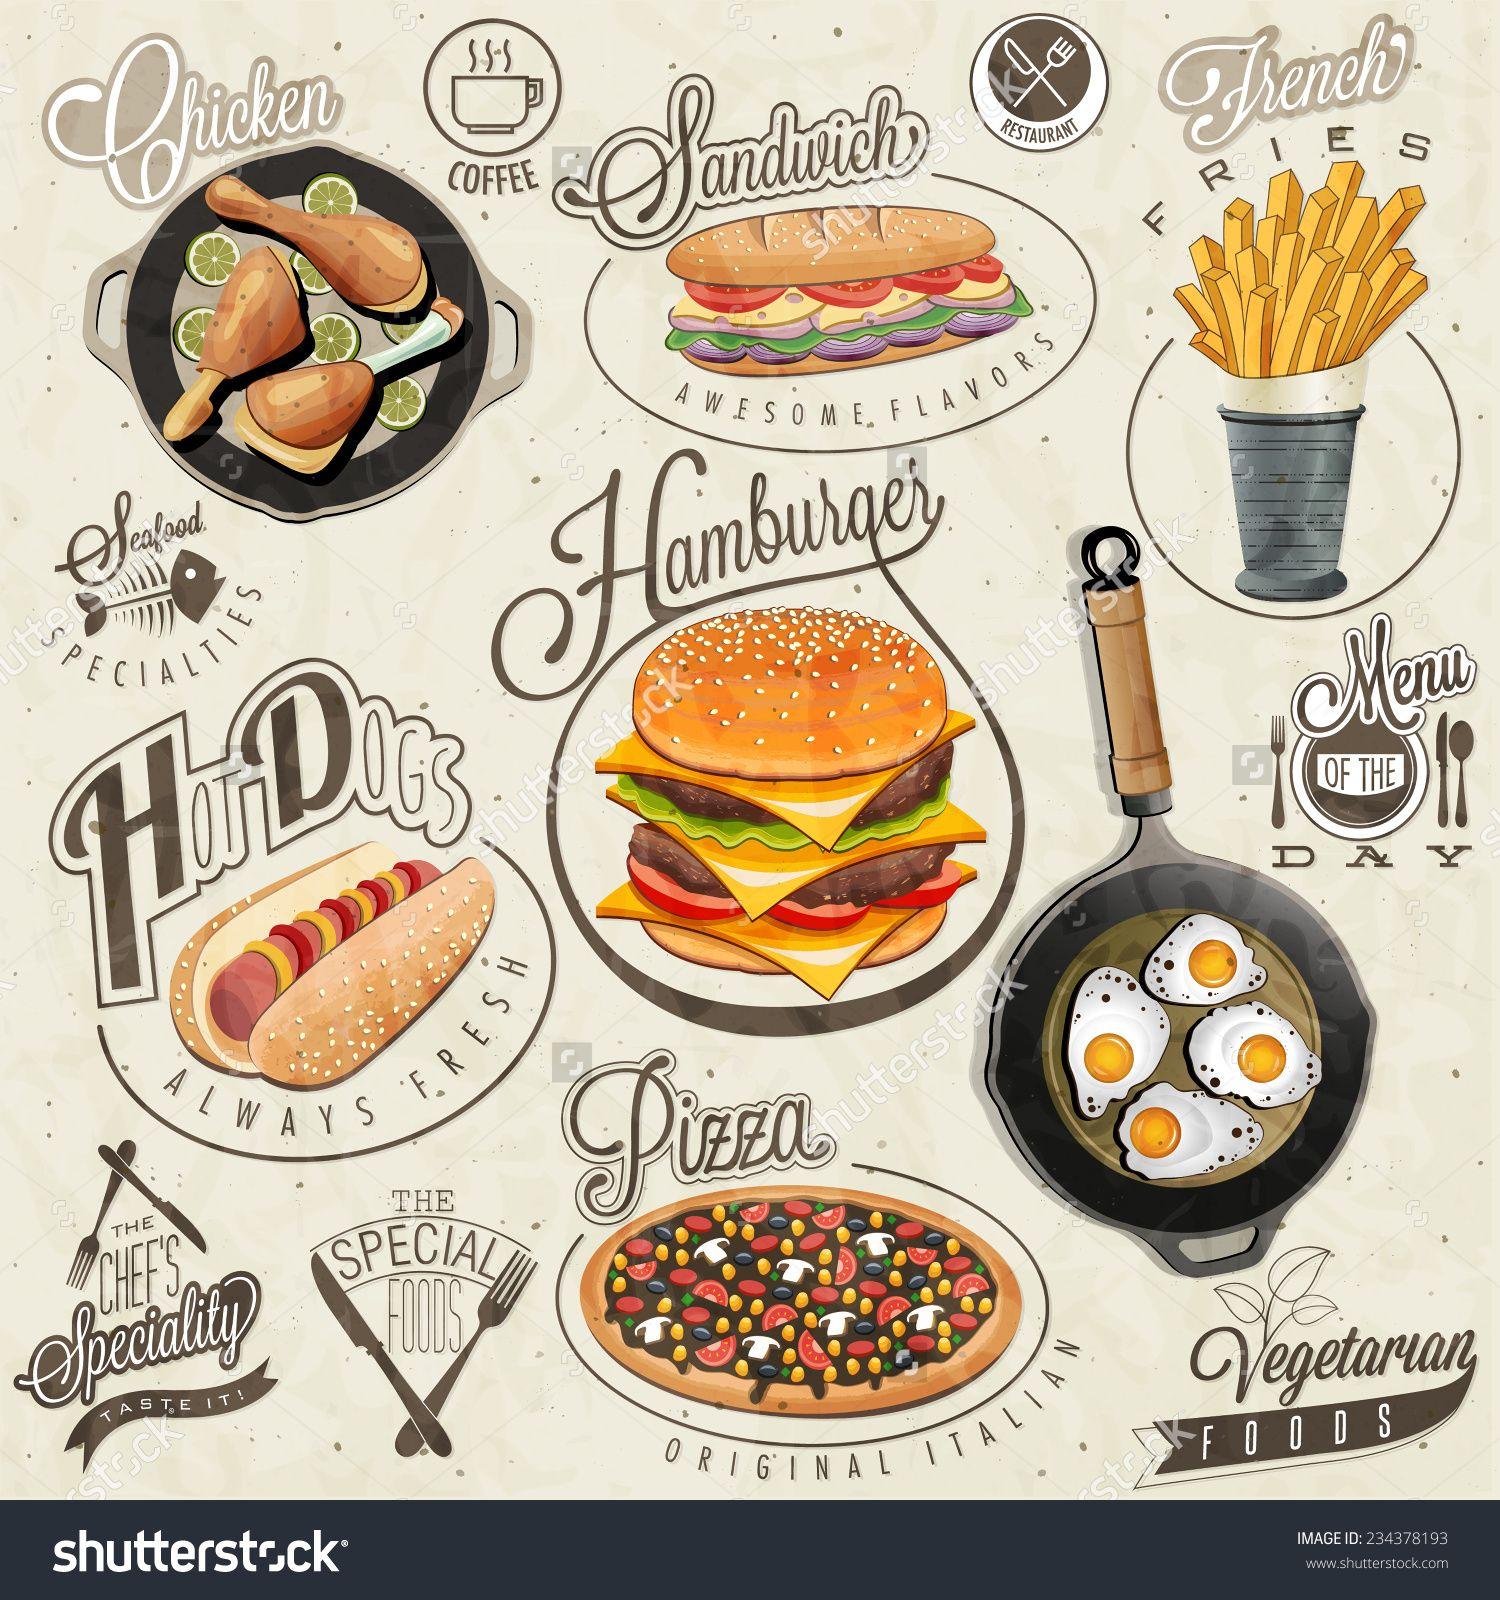 Stock Images Similar To Id 182277182 Retro Vintage Style Fast Food Design De Comida Icones Do Alimento Menu De Comida